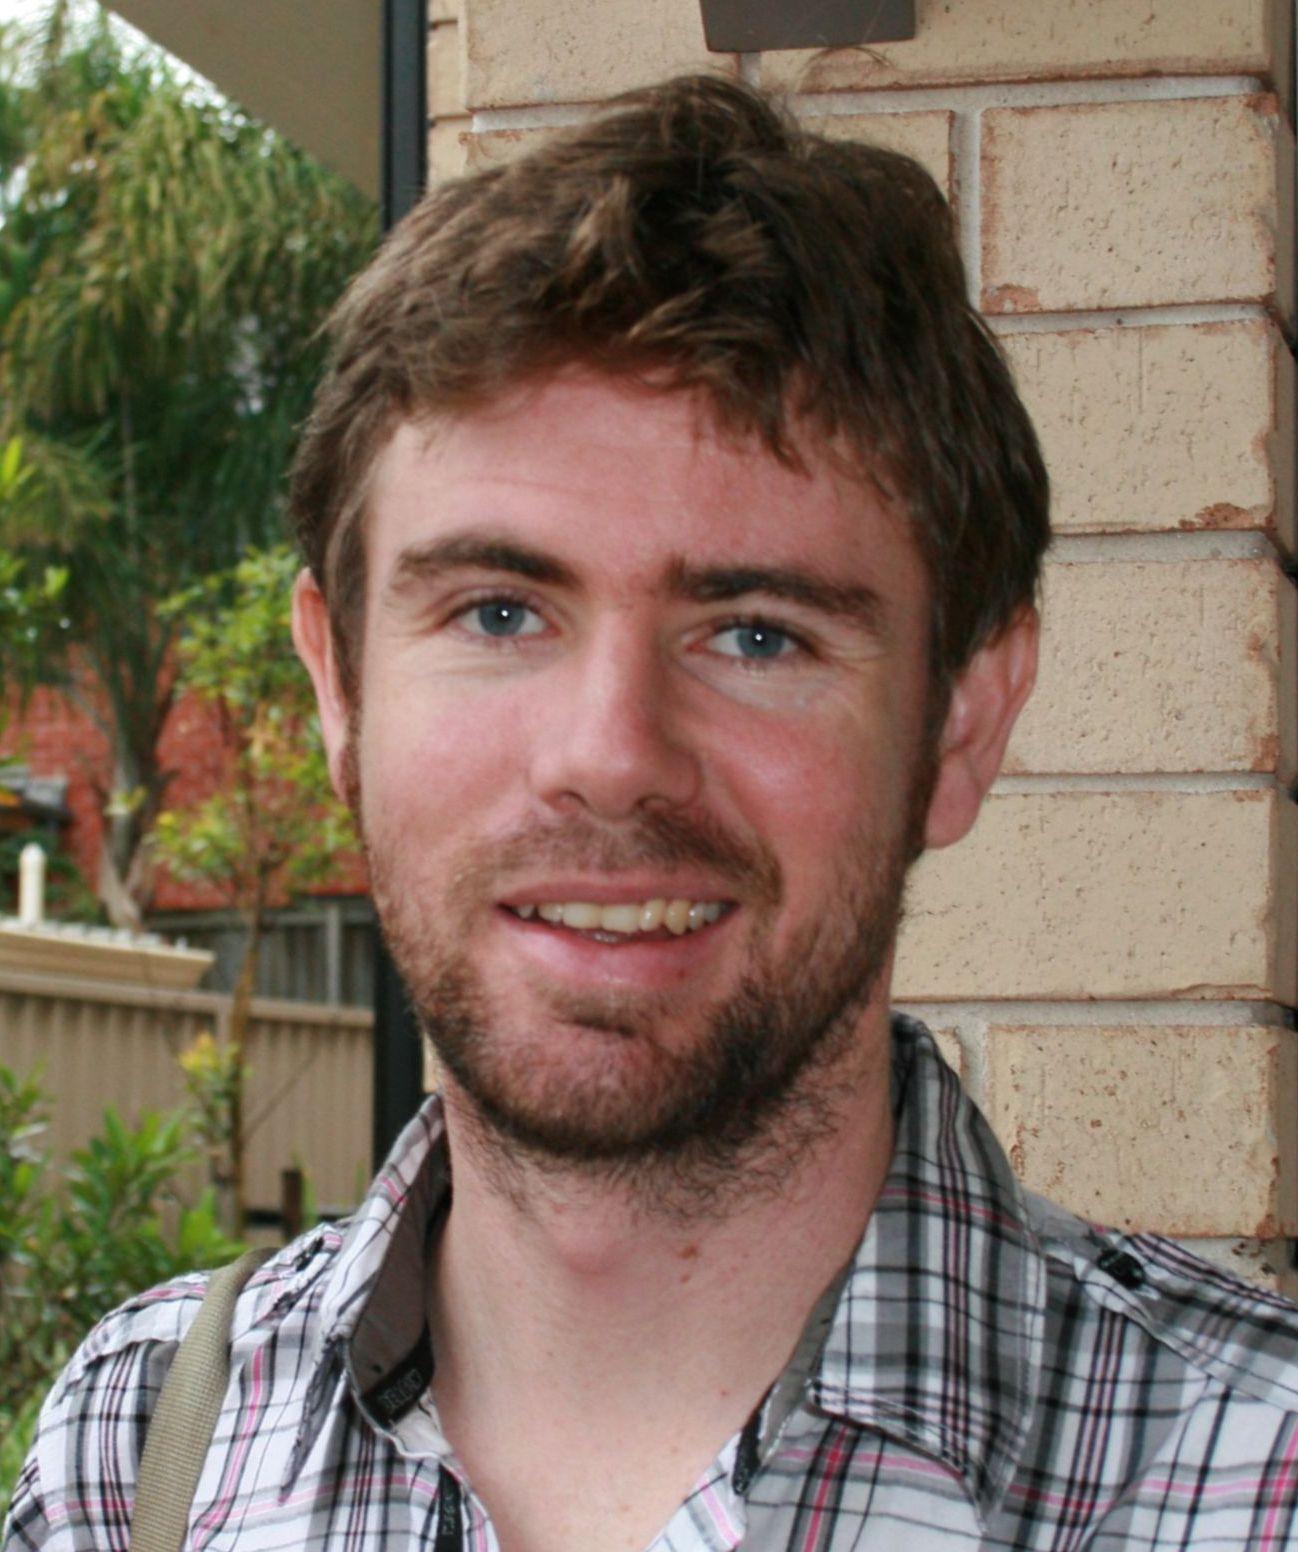 Associate Professor James Gareth Wood